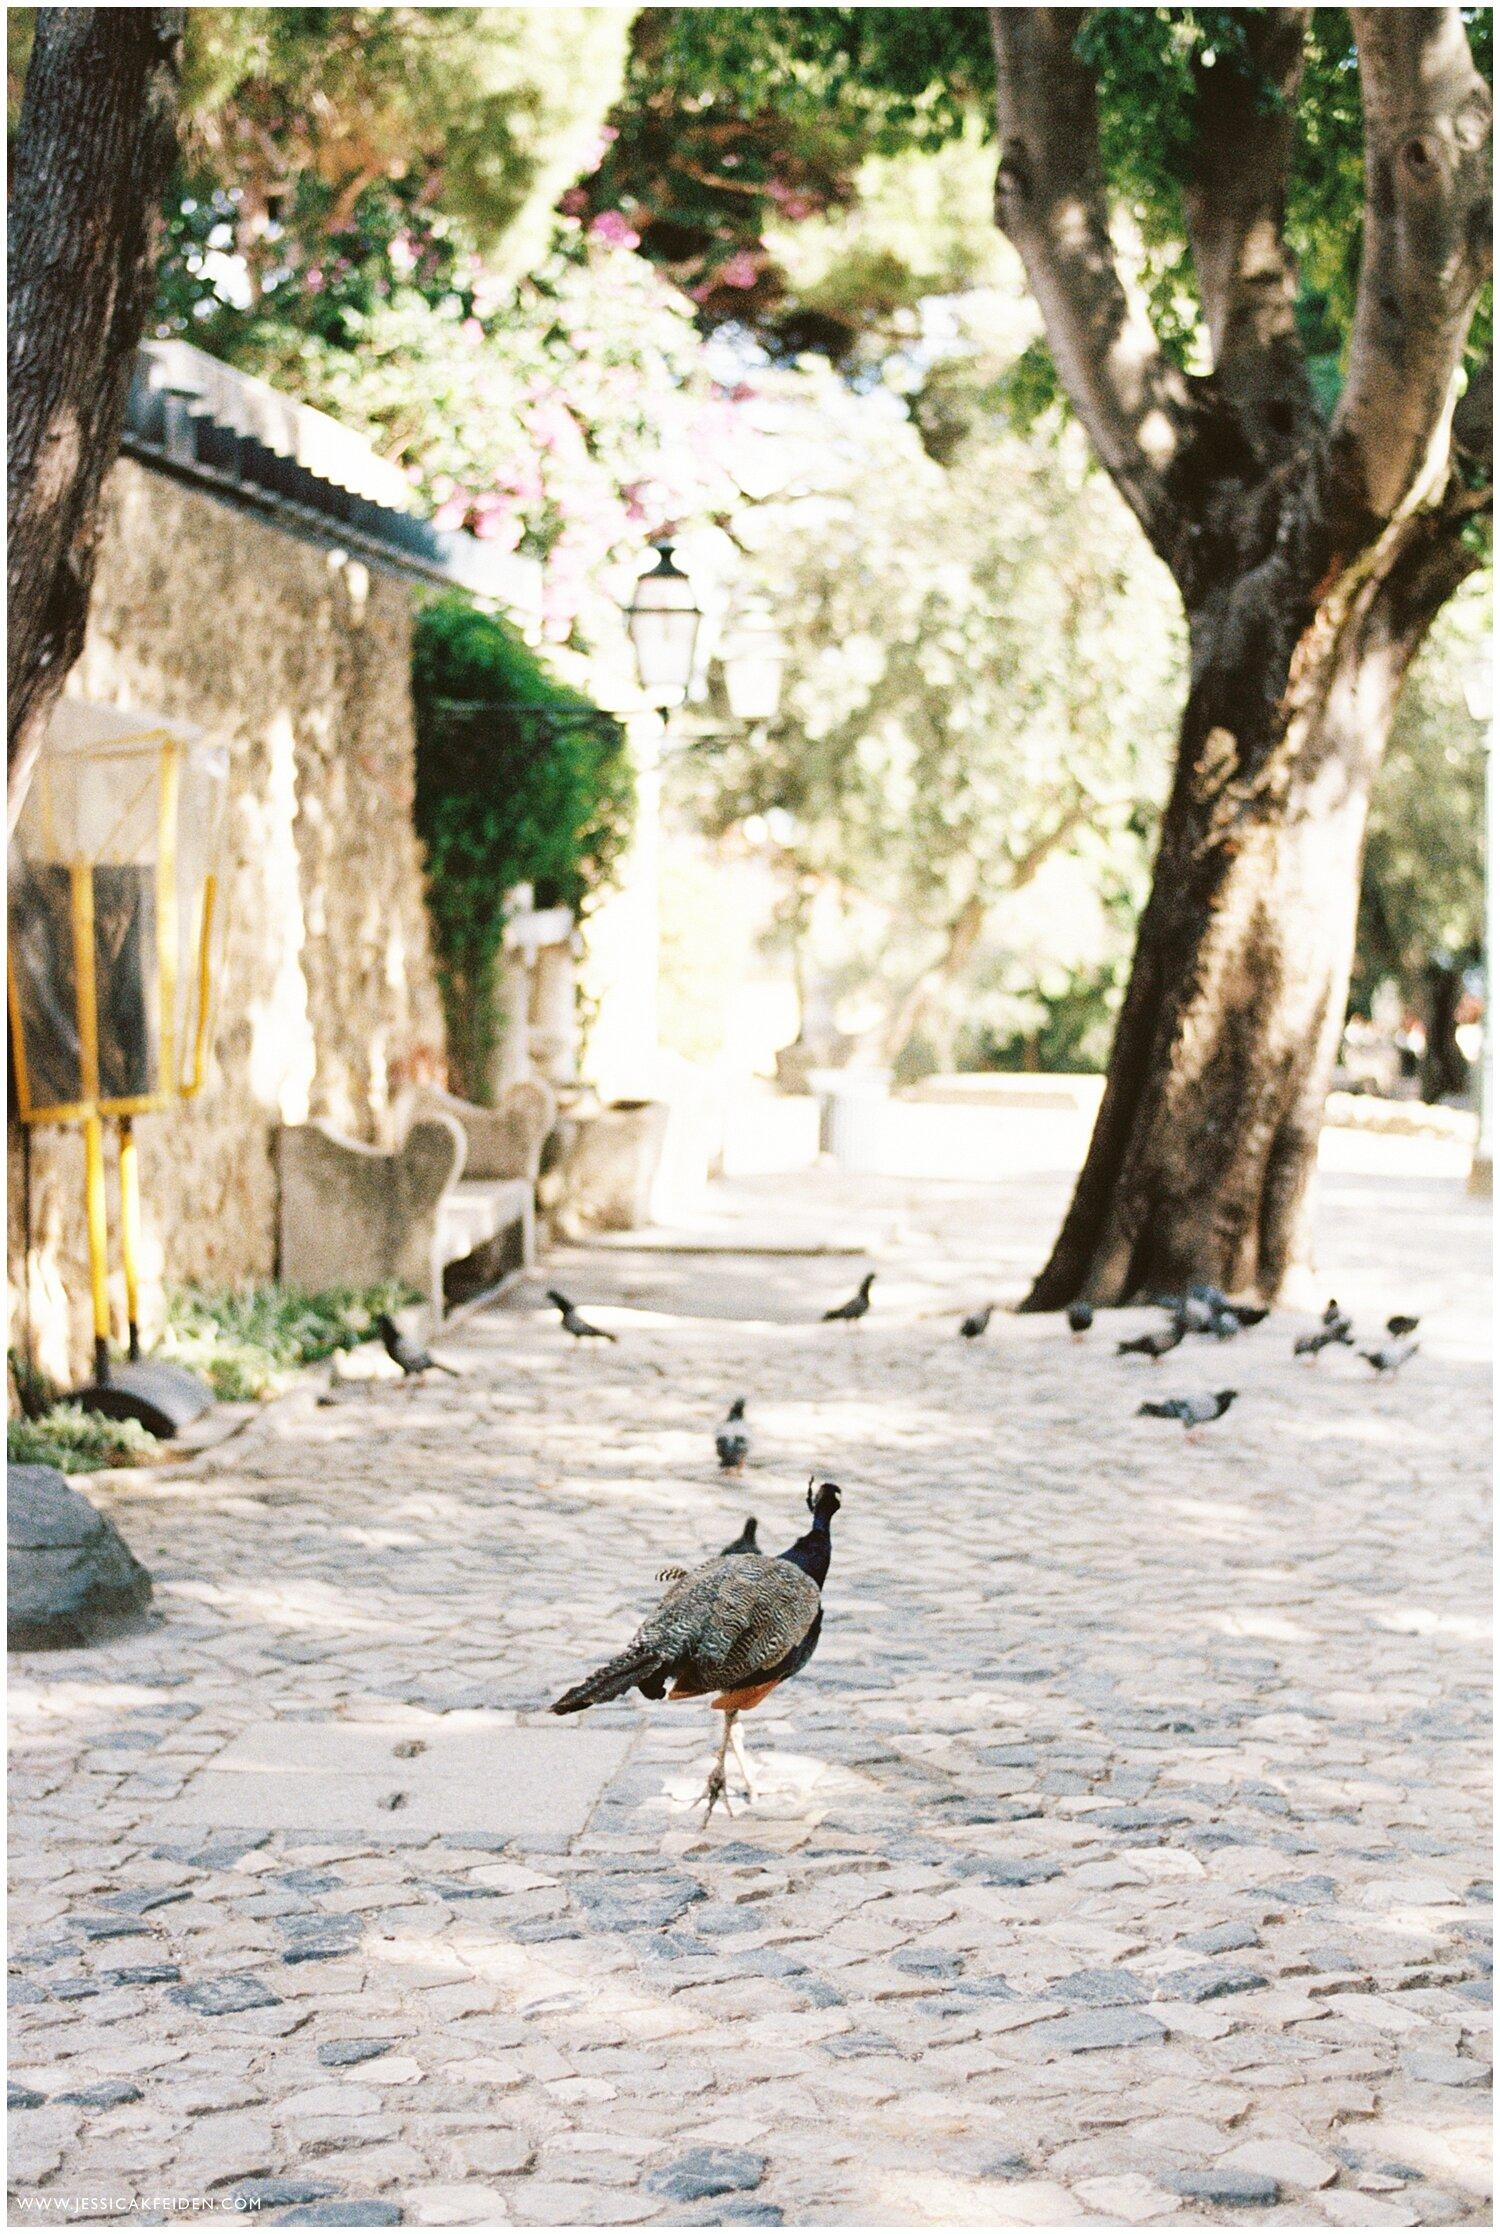 Jessica K Feiden Photography_Portugal Film Photographer_Portugal Travel Photographs_0017.jpg